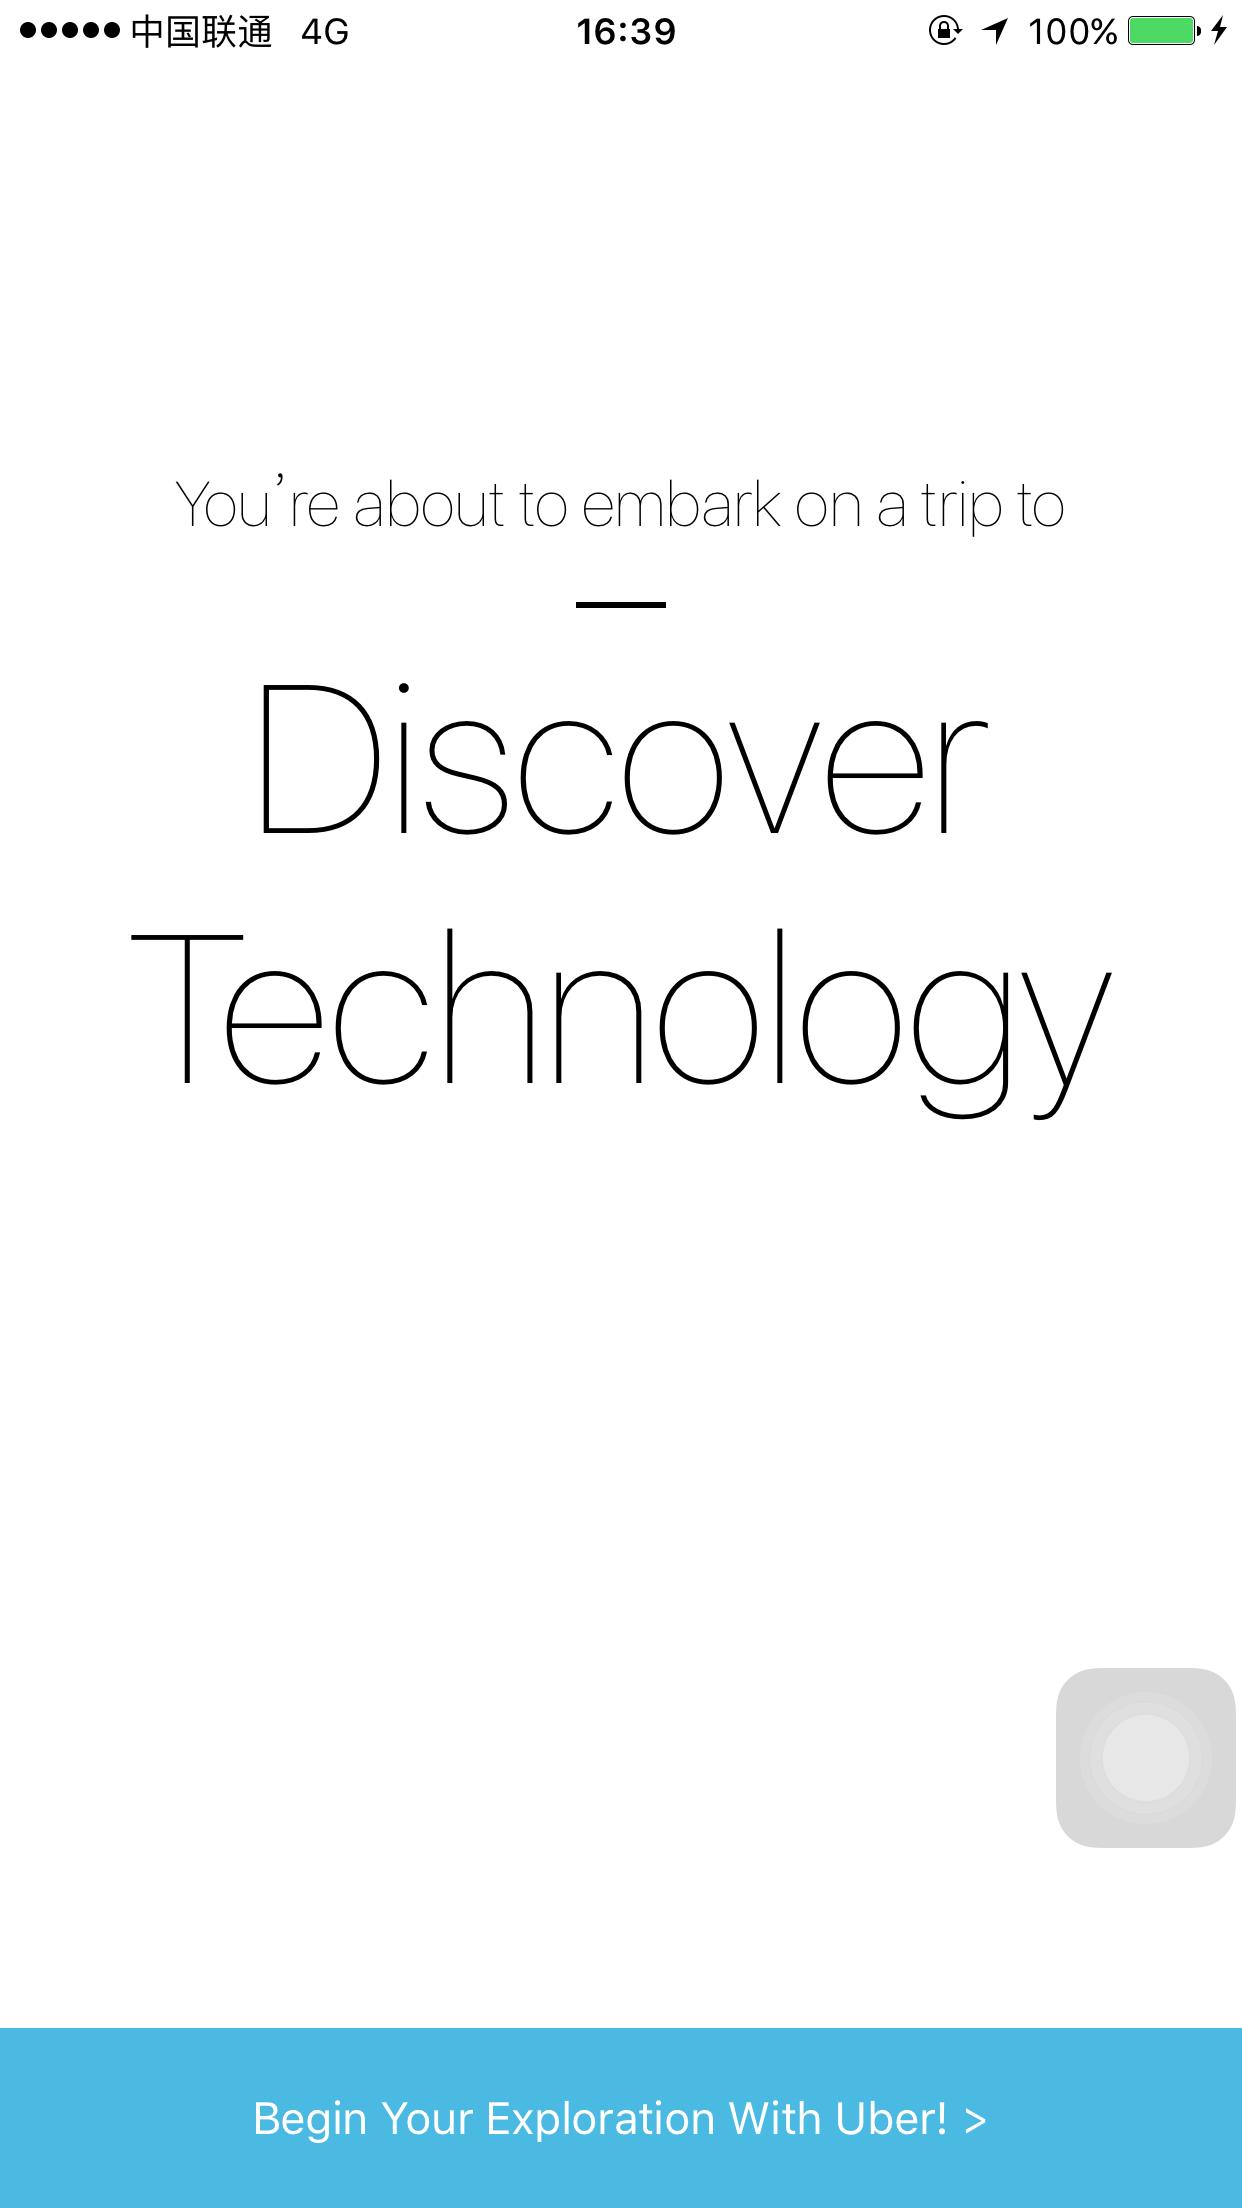 GitHub - hACKbUSTER/UberGuide-iOS: Third Prize for Uber